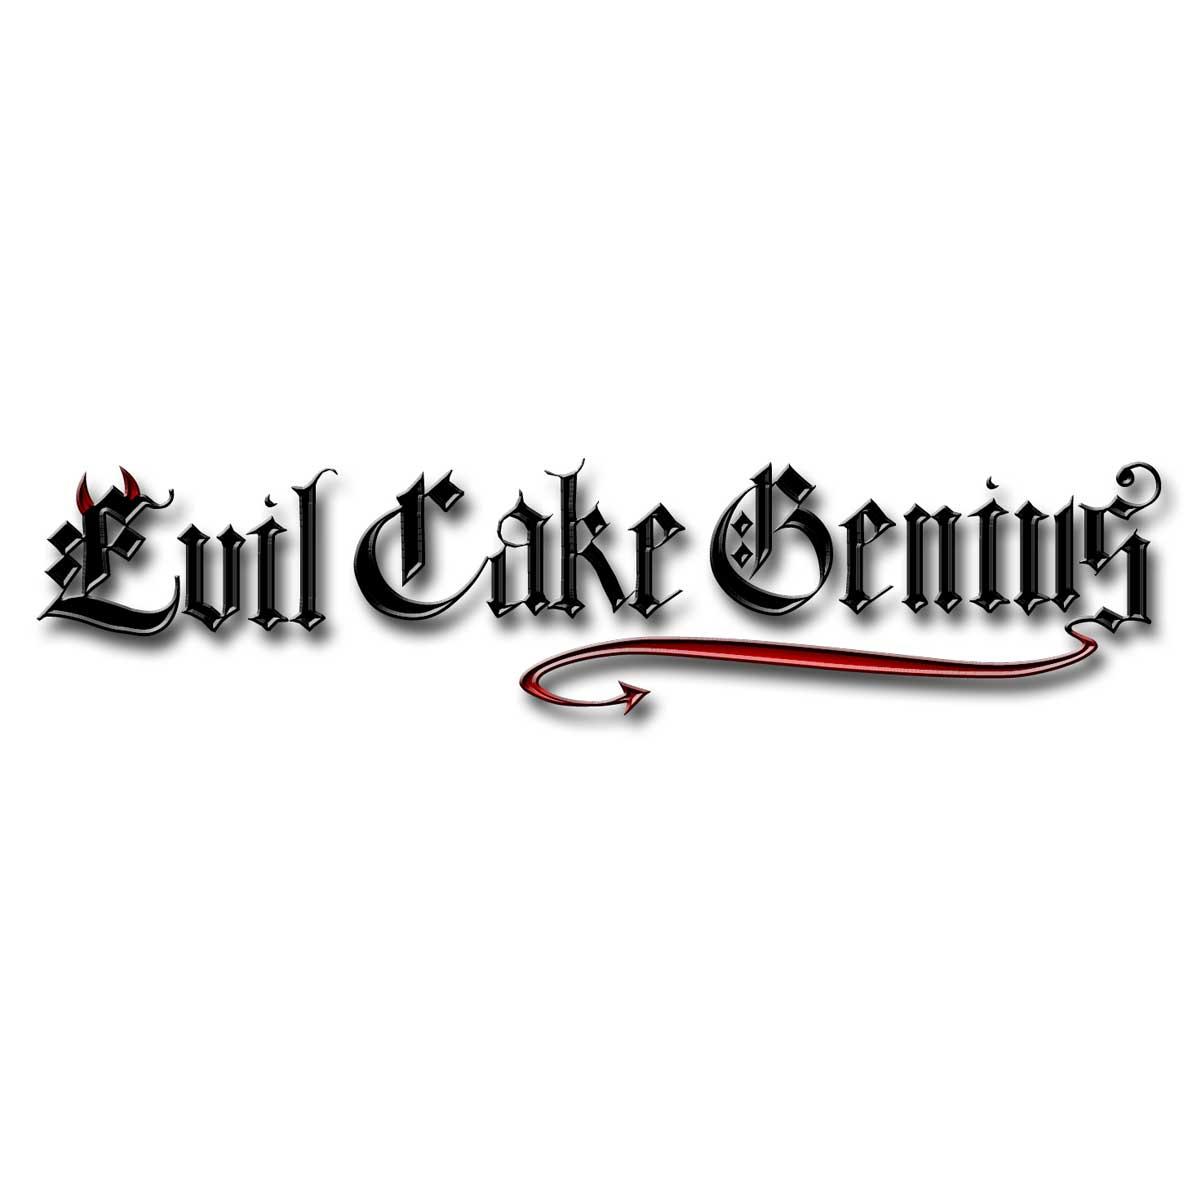 Winter Birch Cake Stencil Evil Cake Genius